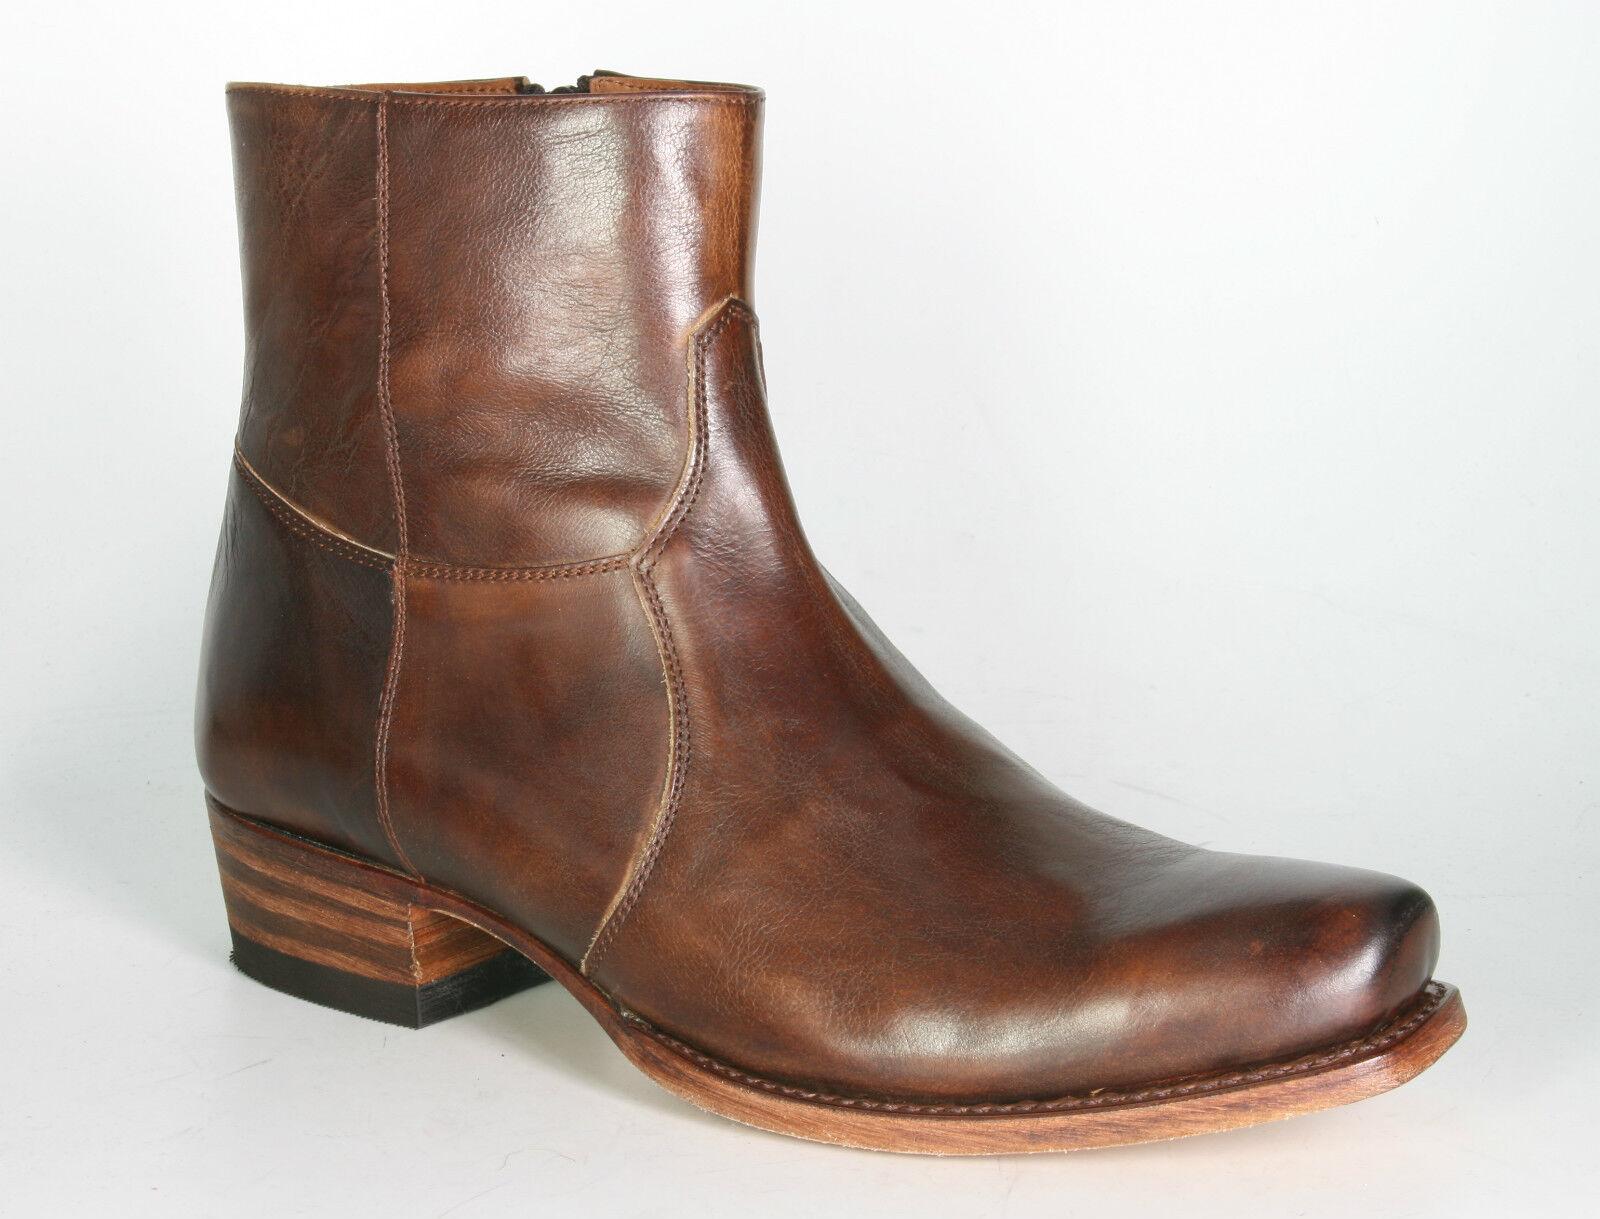 5200 Sendra Stiefelette INSA Deep Nat. Lavado Marron Rahmengenähte Schuhe